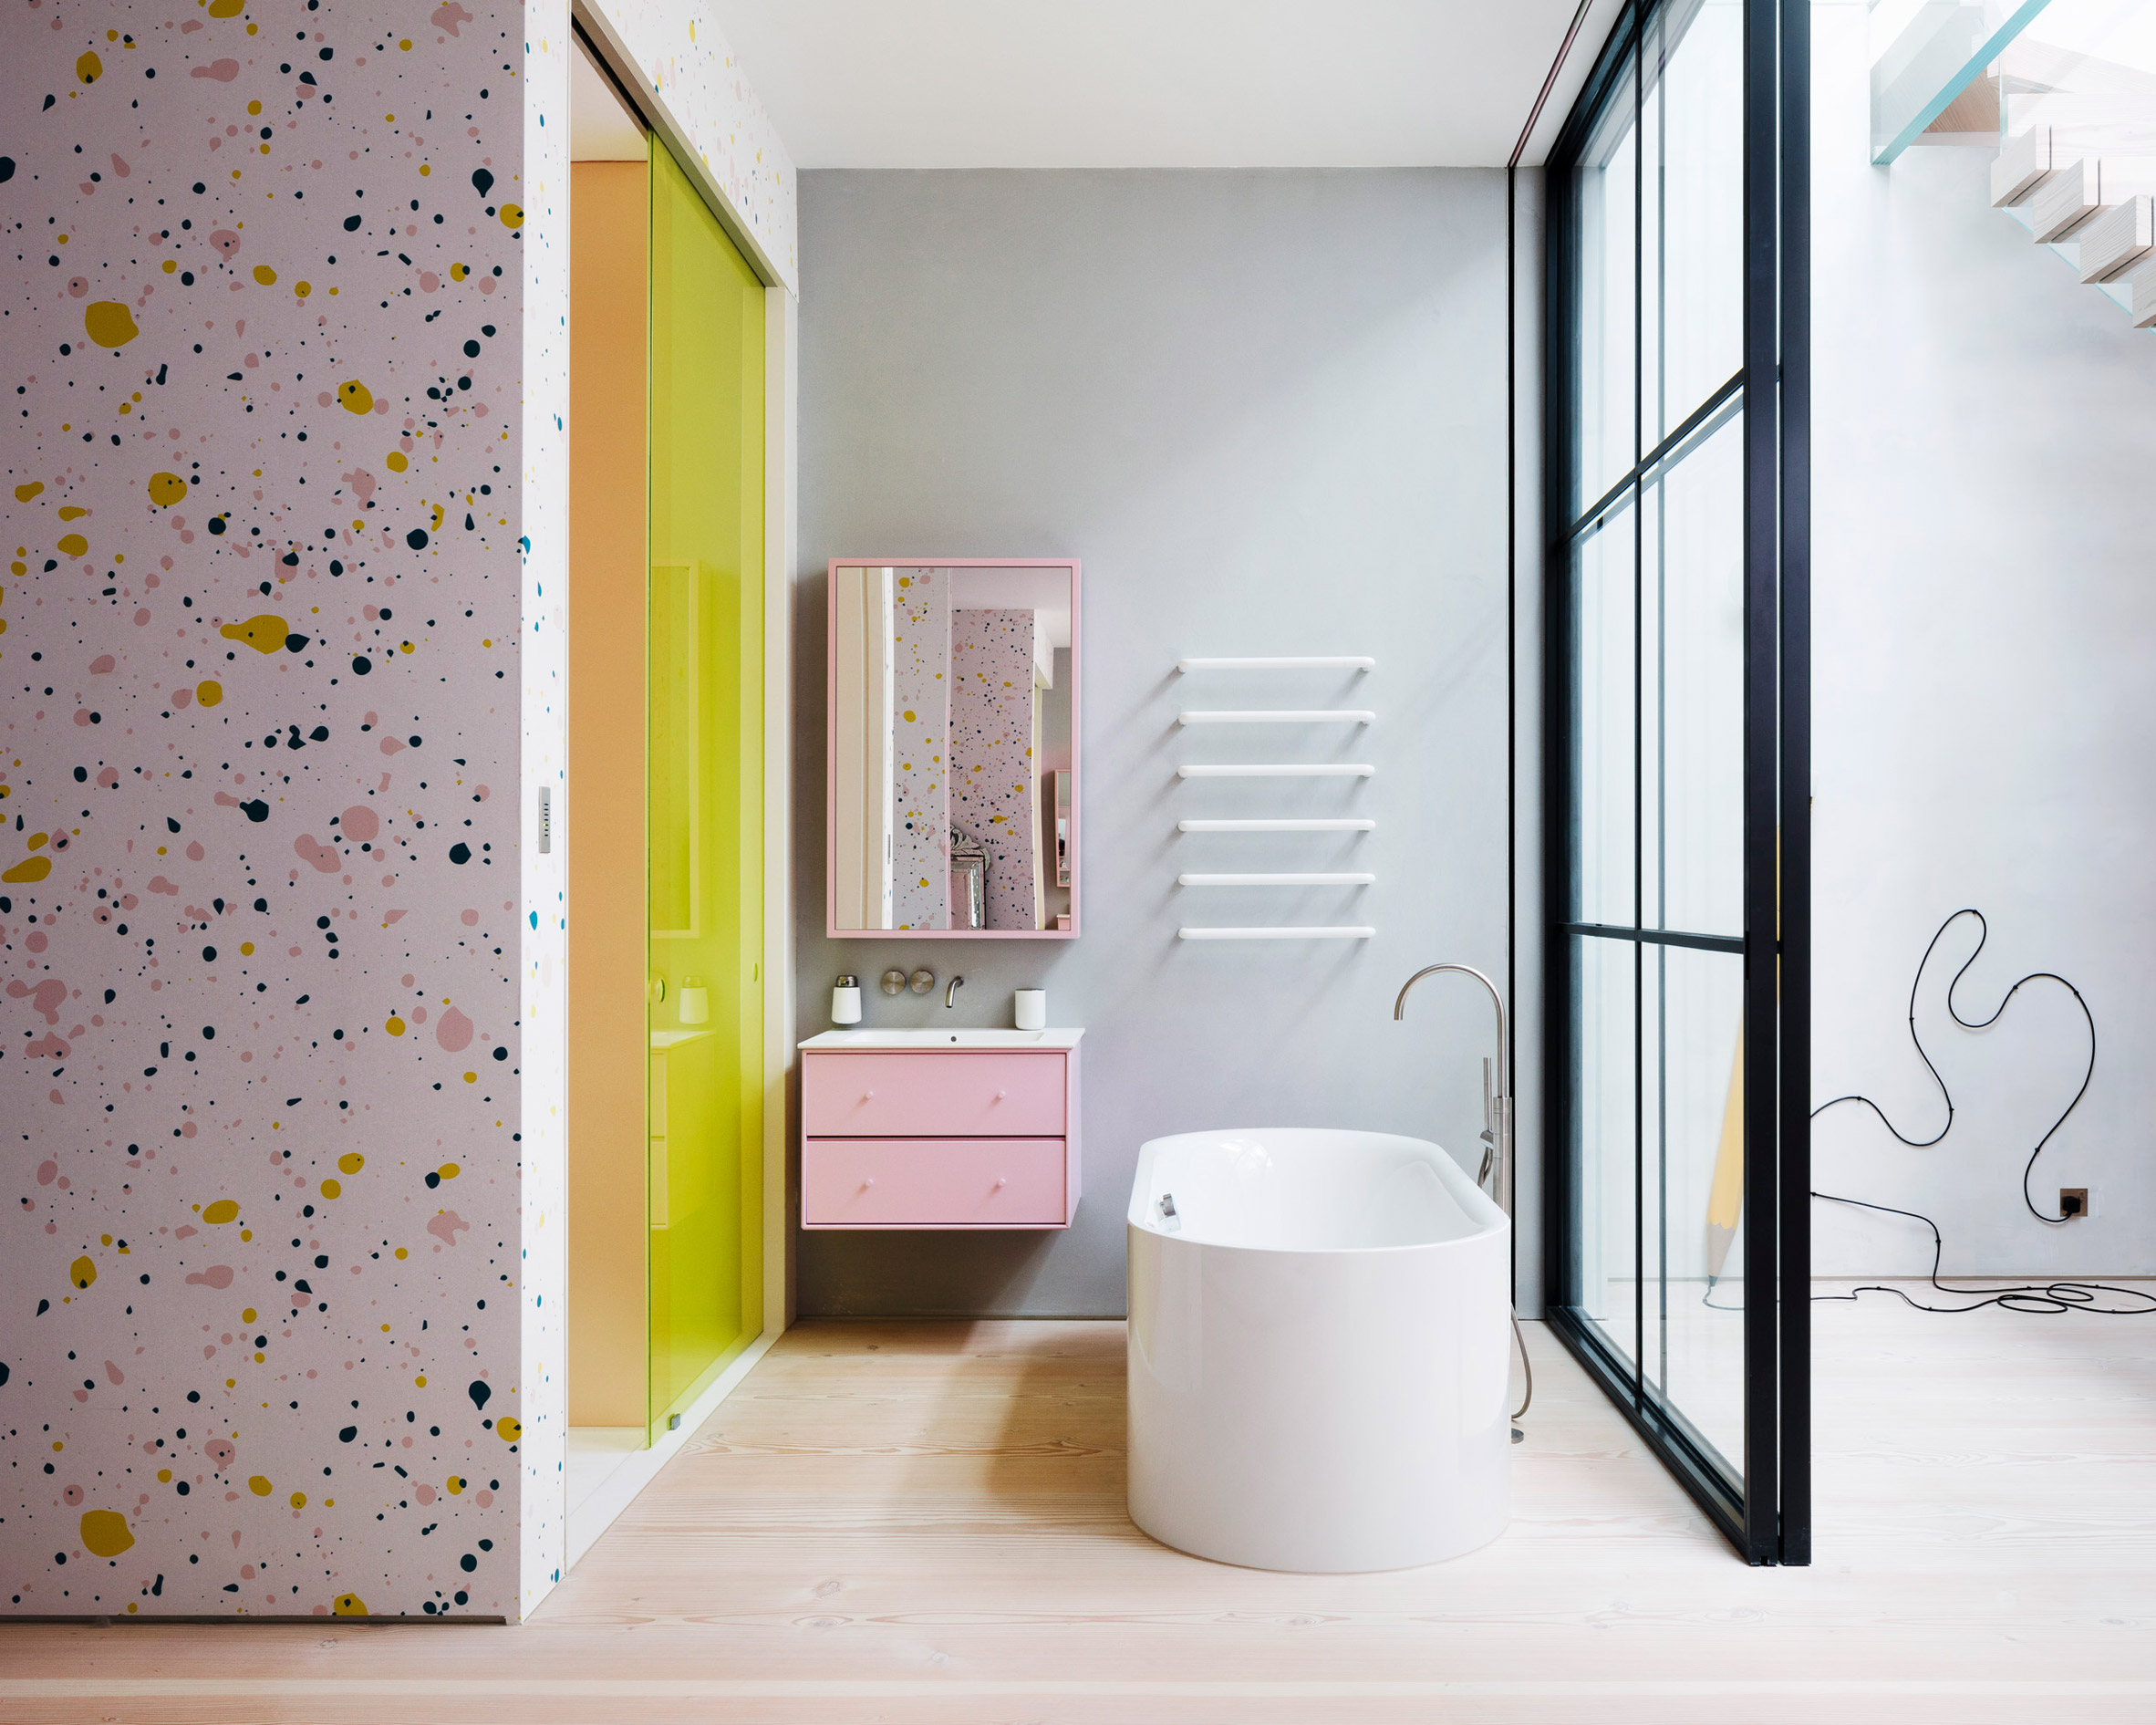 Turners Studio by Rodić Davidson Architects